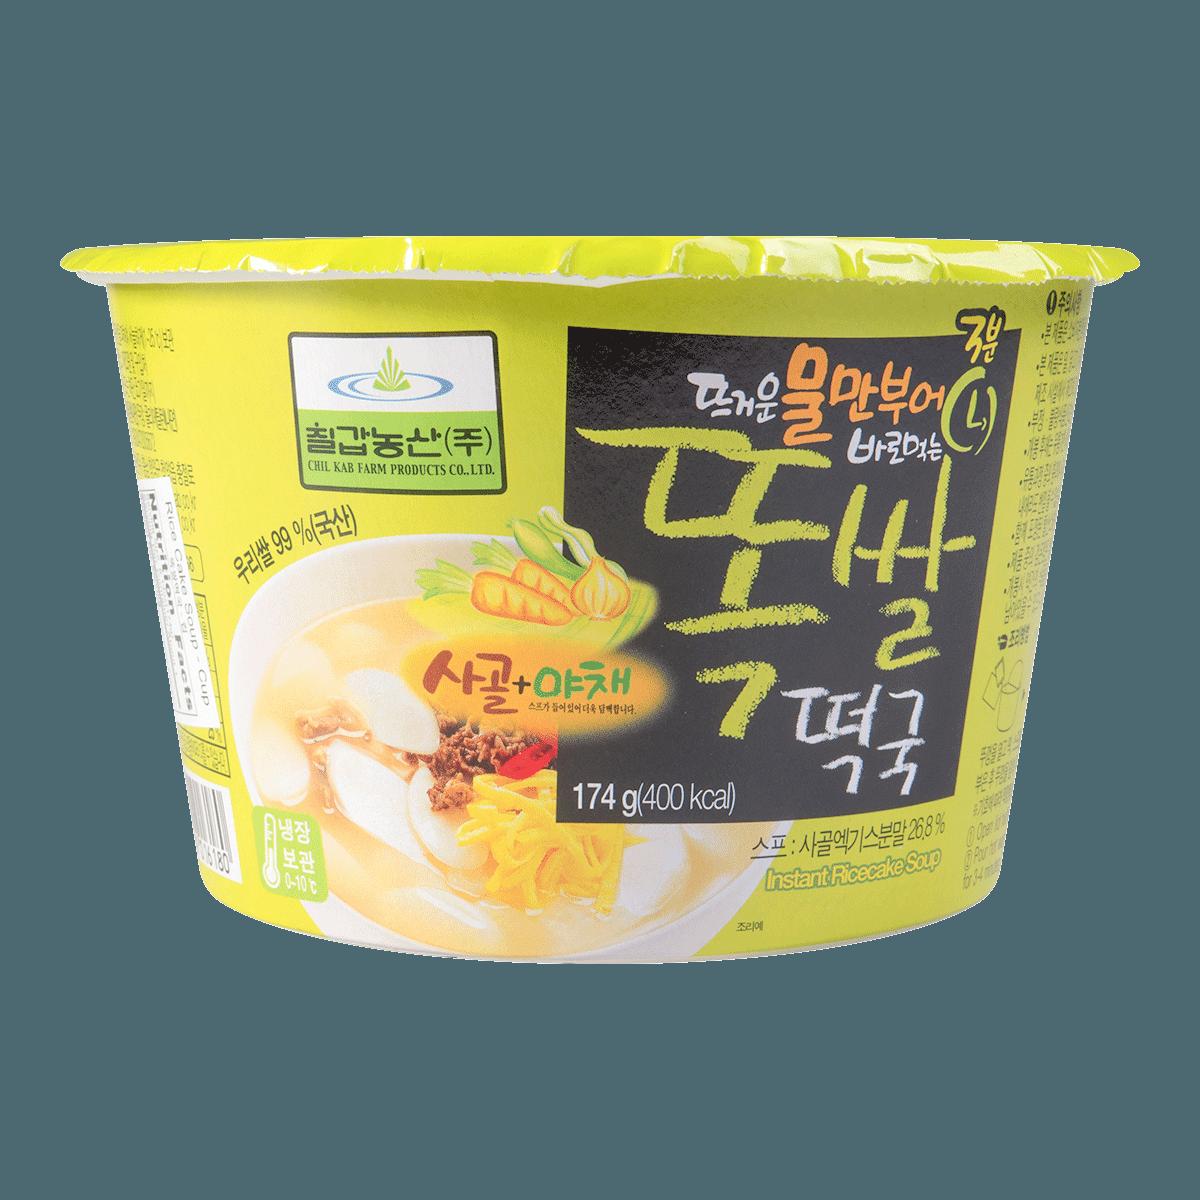 韩国CHILKAB 牛骨年糕汤 碗装 174g